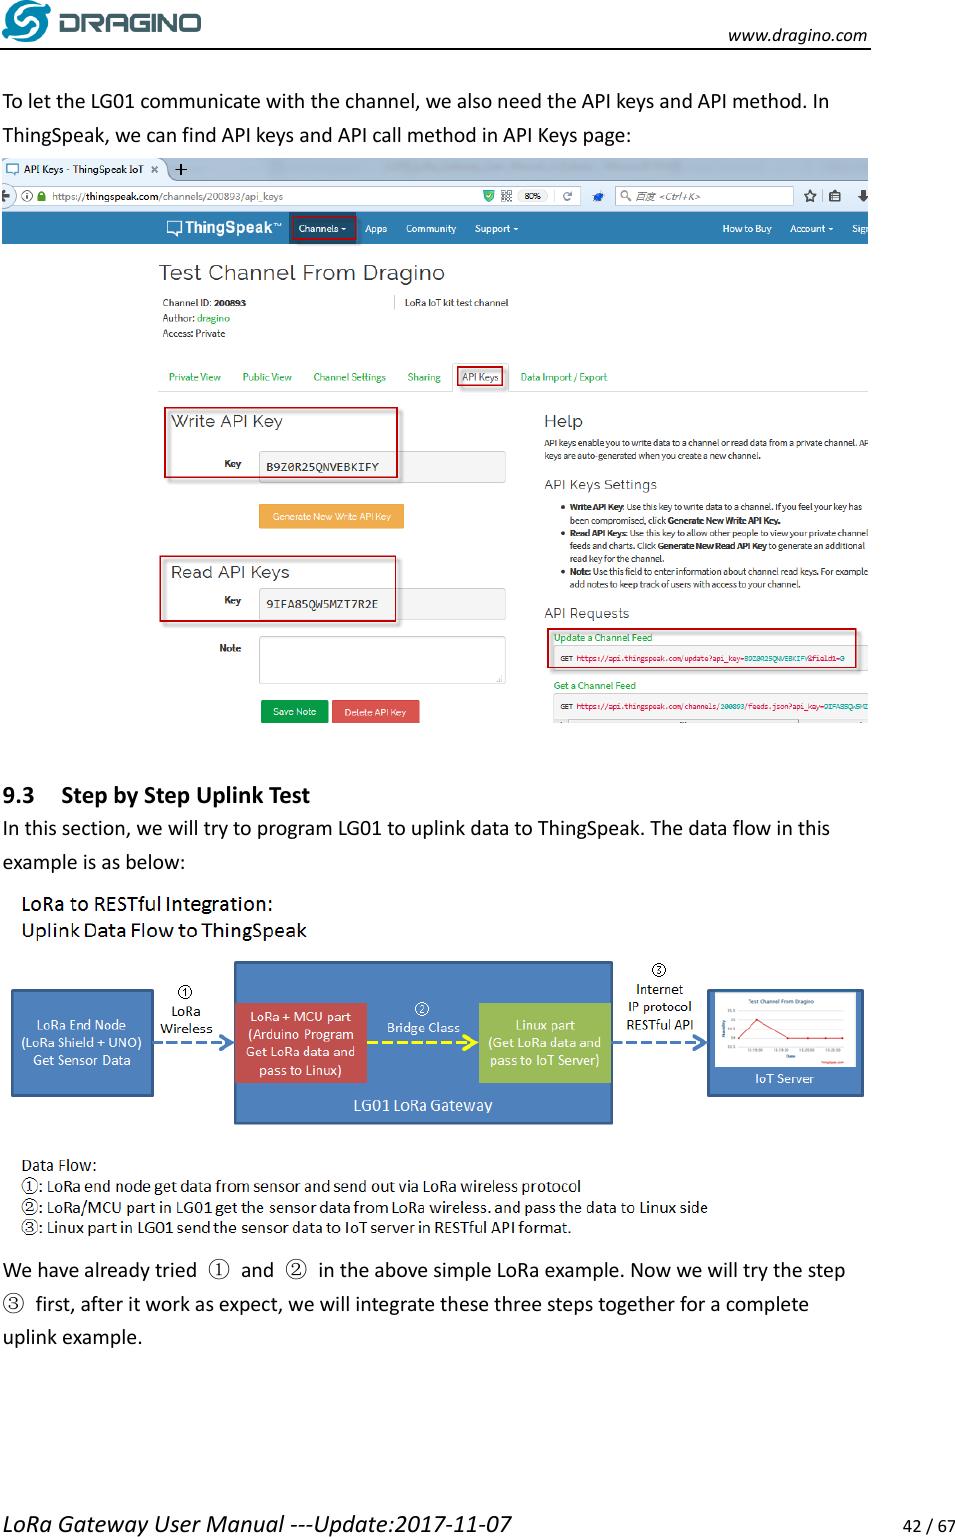 LG01 Lo Ra Gateway User Manual